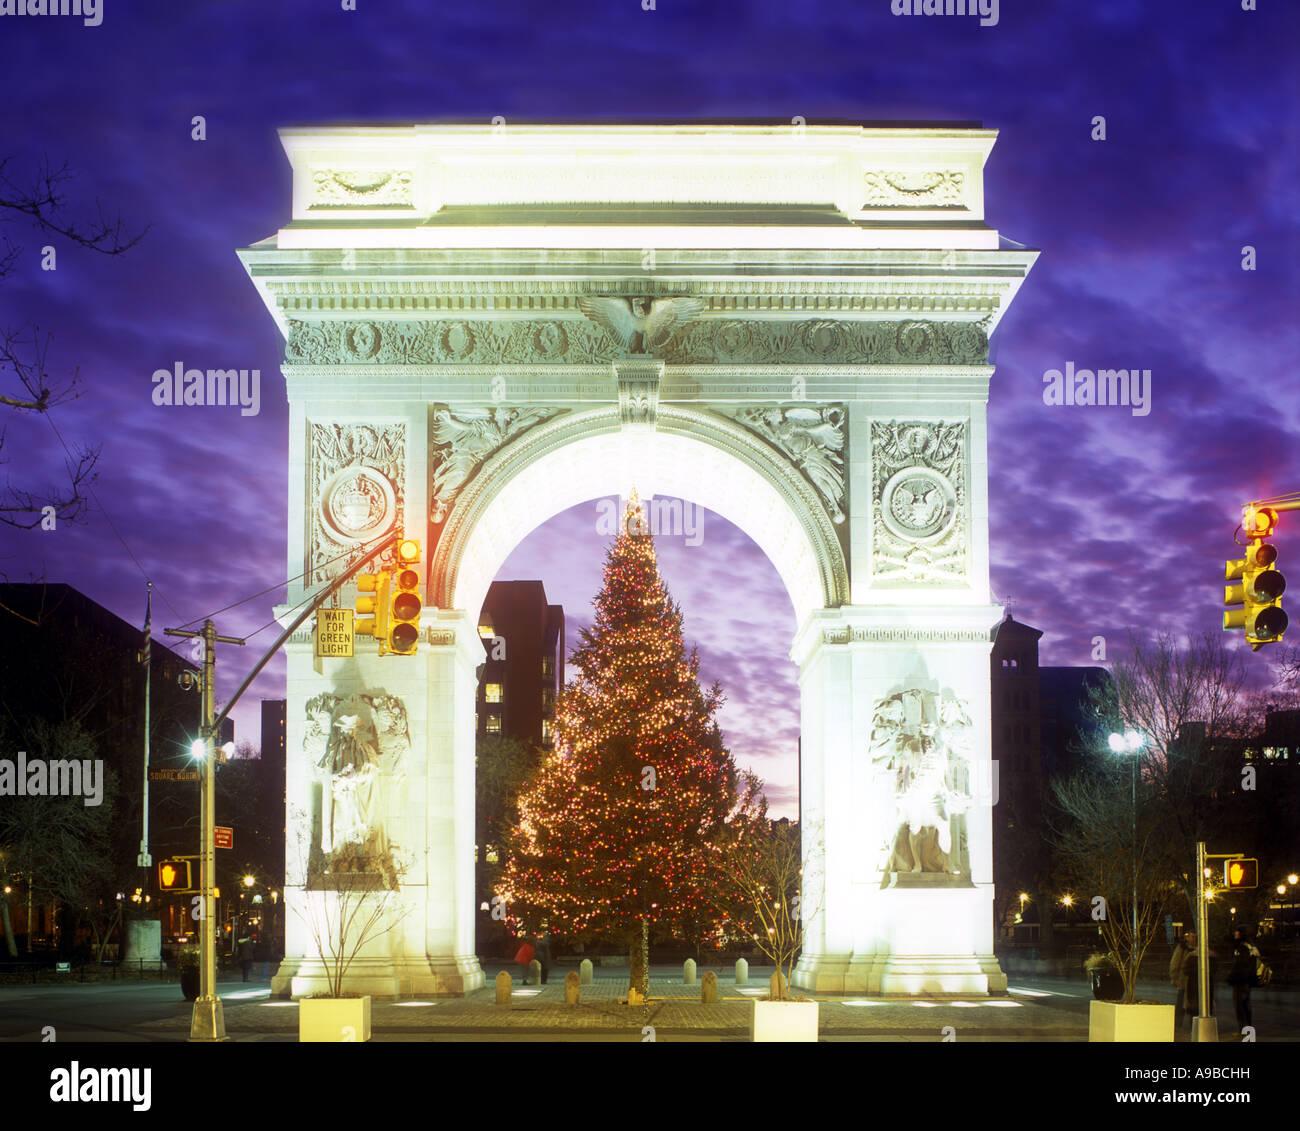 f1e6ed9b1 CHRISTMAS TREE NORTH FACE WASHINGTON SQUARE ARCH (©MCKIM MEAD ...